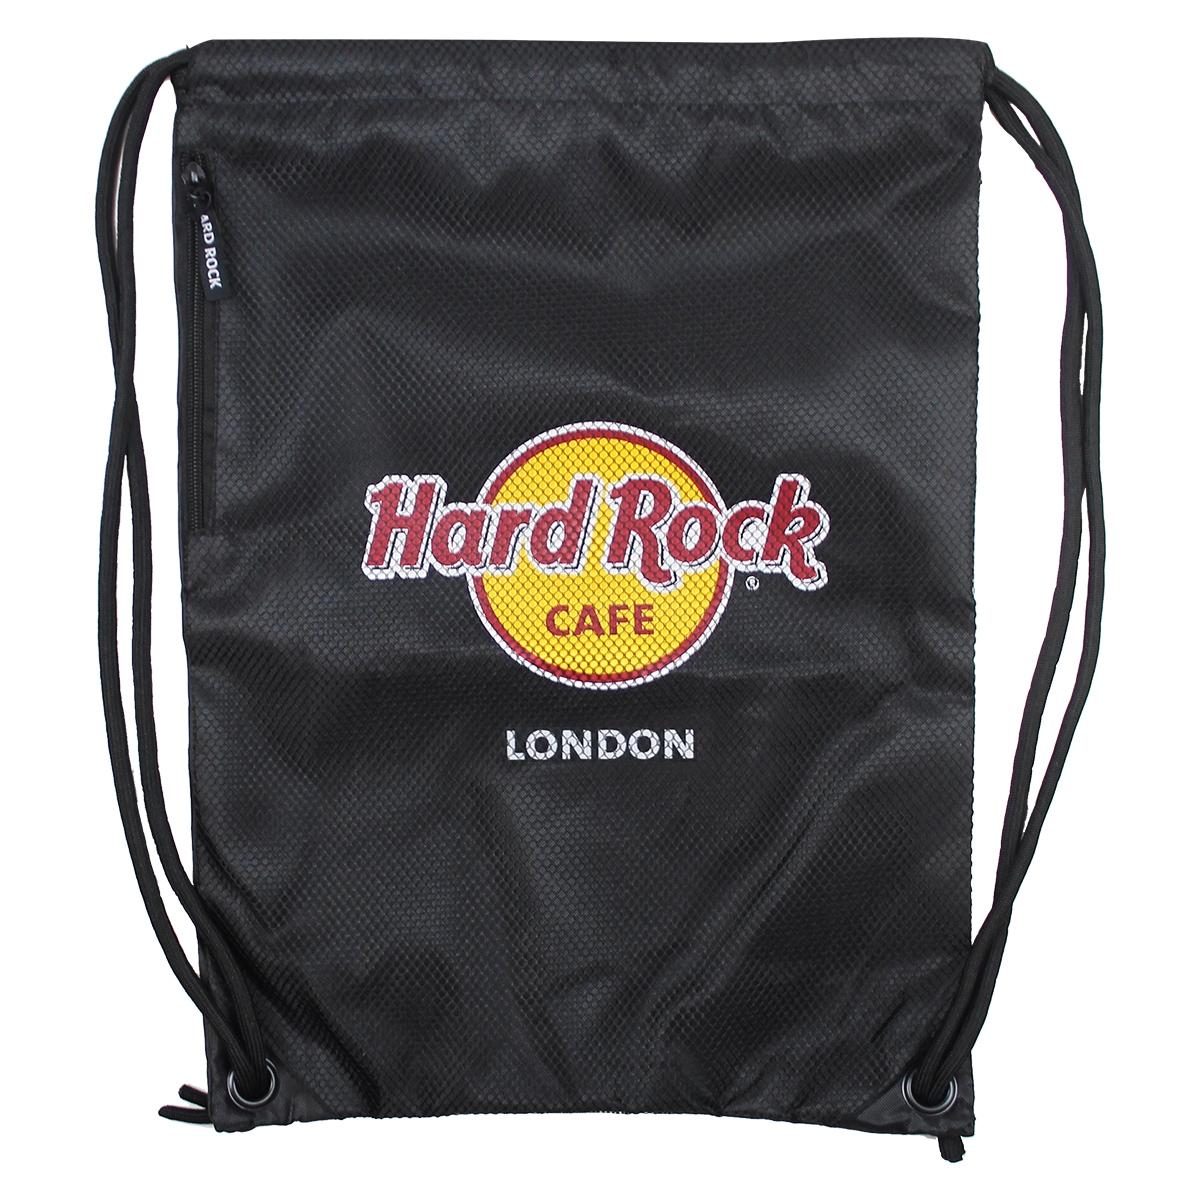 Distressed Mesh Cinch Bag, London 0